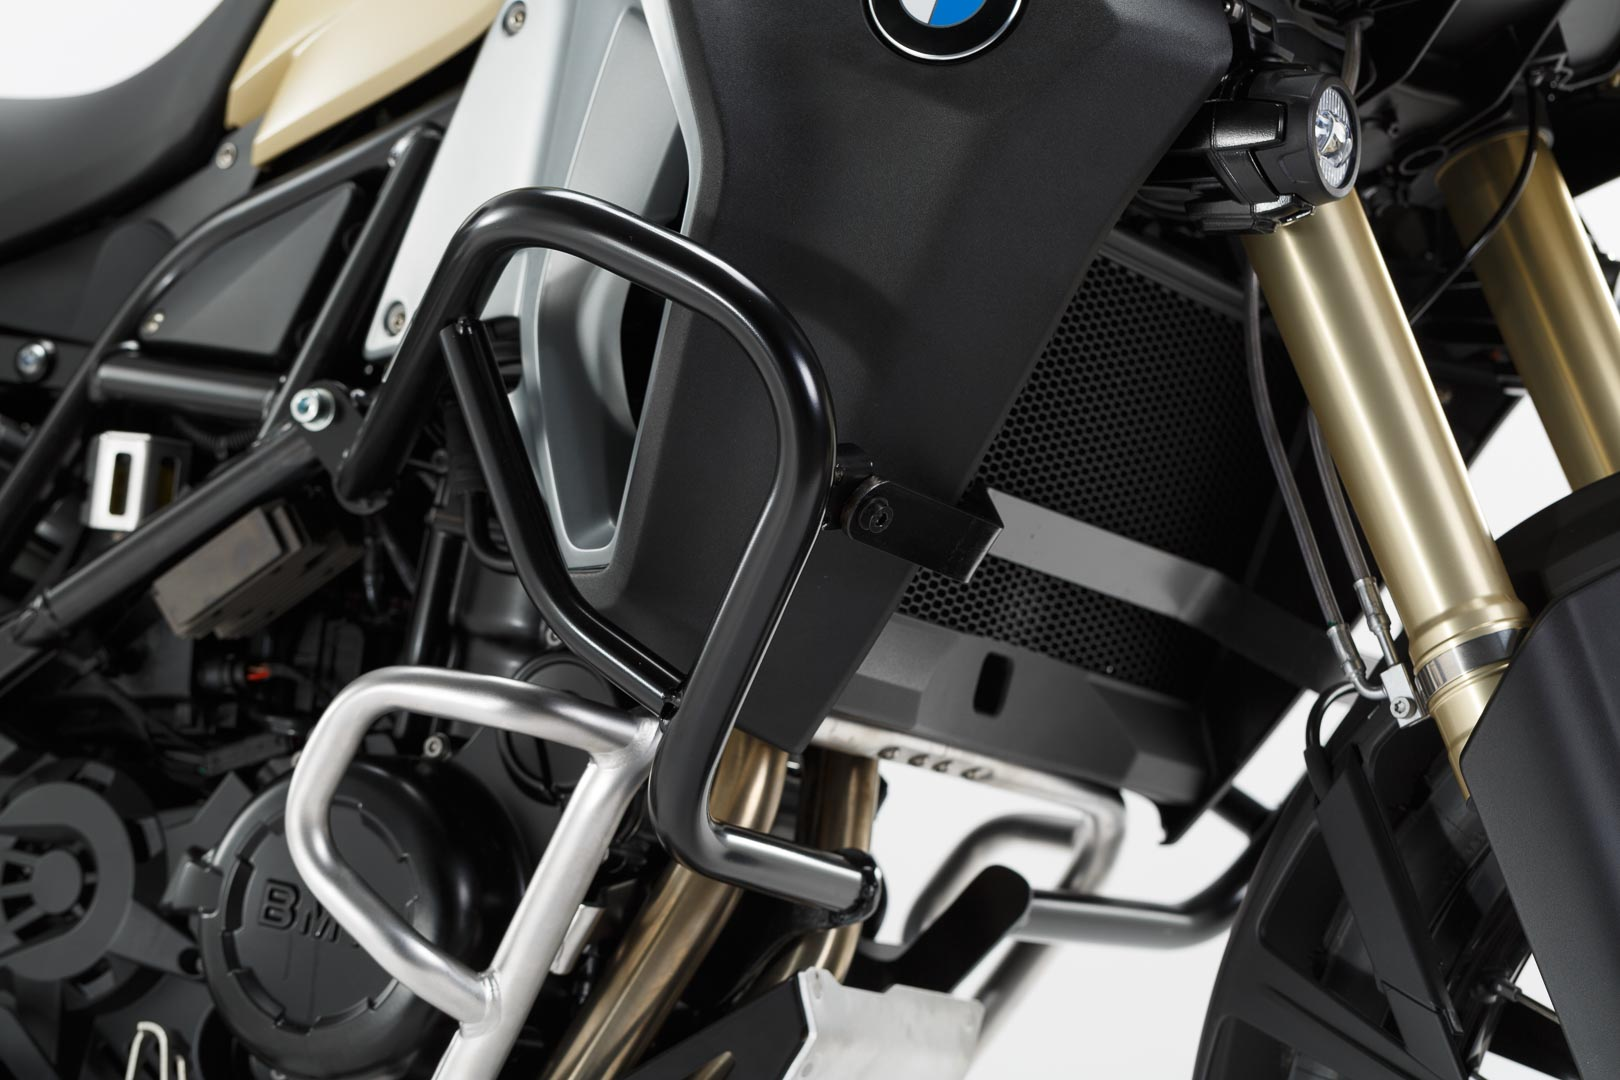 SW-Motech Moottorinsuojarauta BMW F800GS Adventure